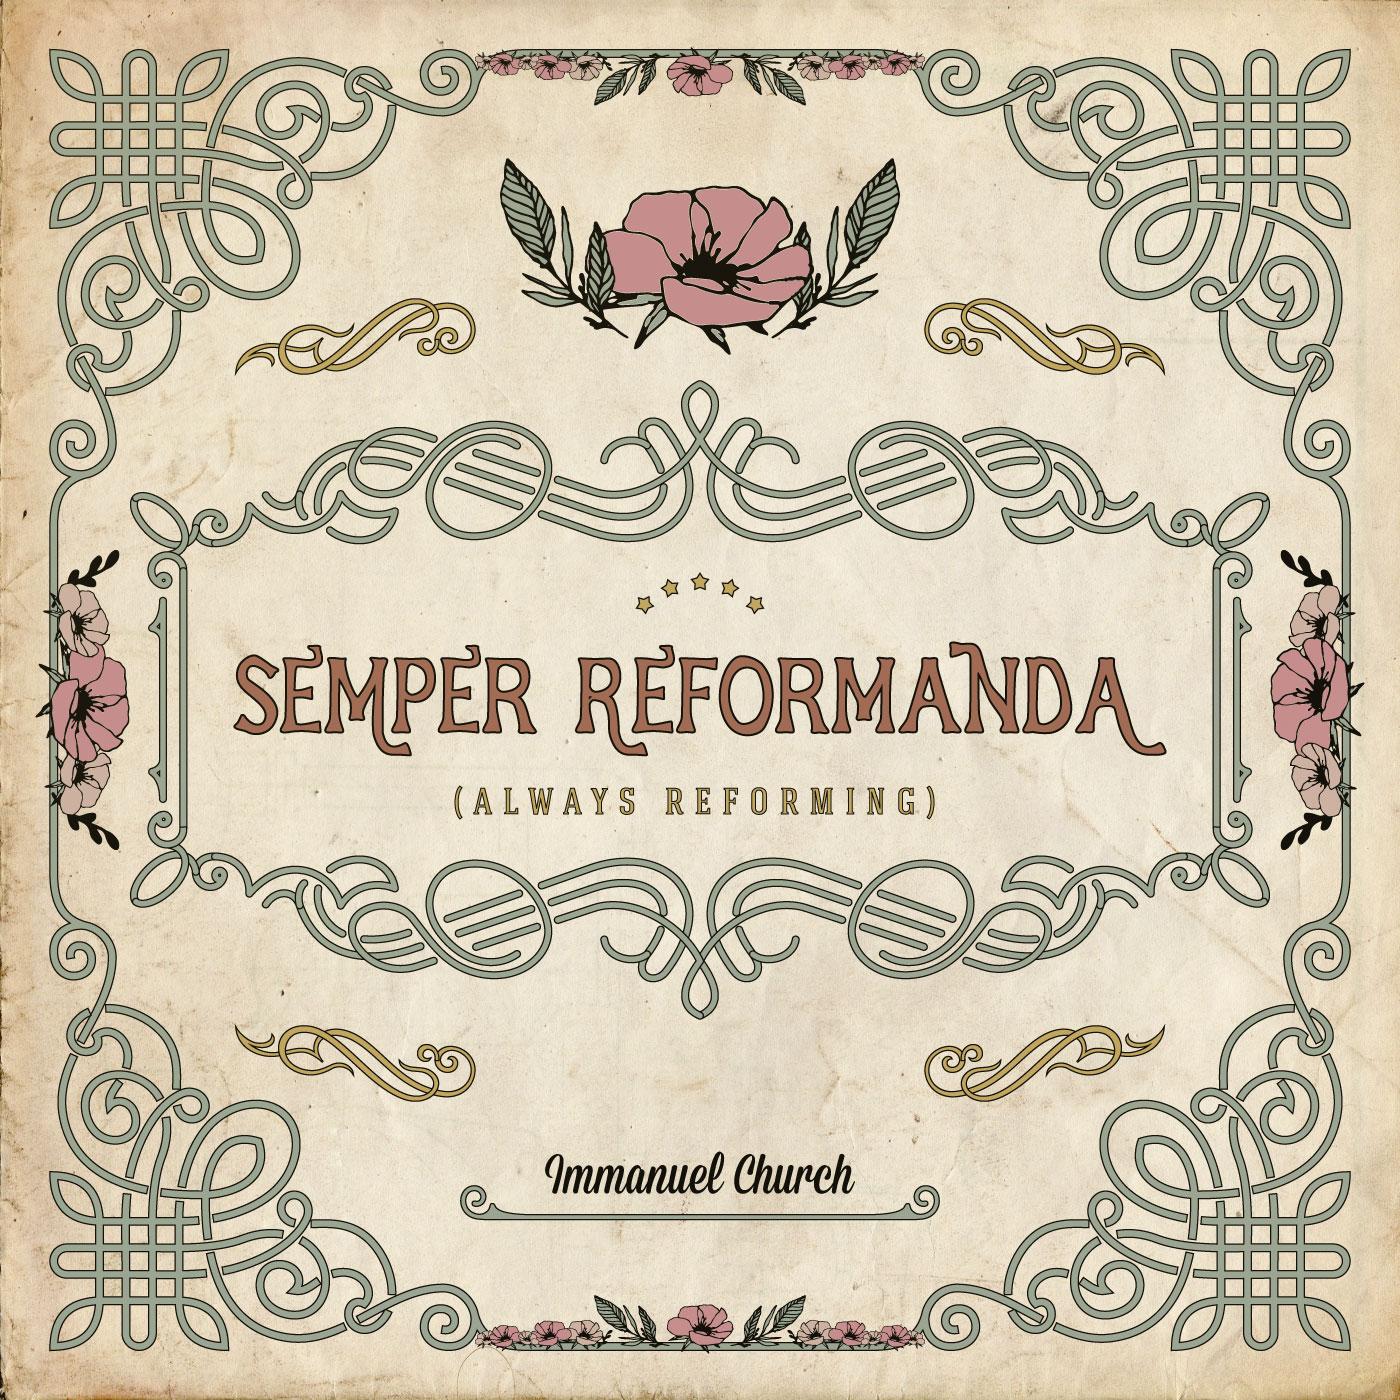 Semper Reformanda - Always Reforming